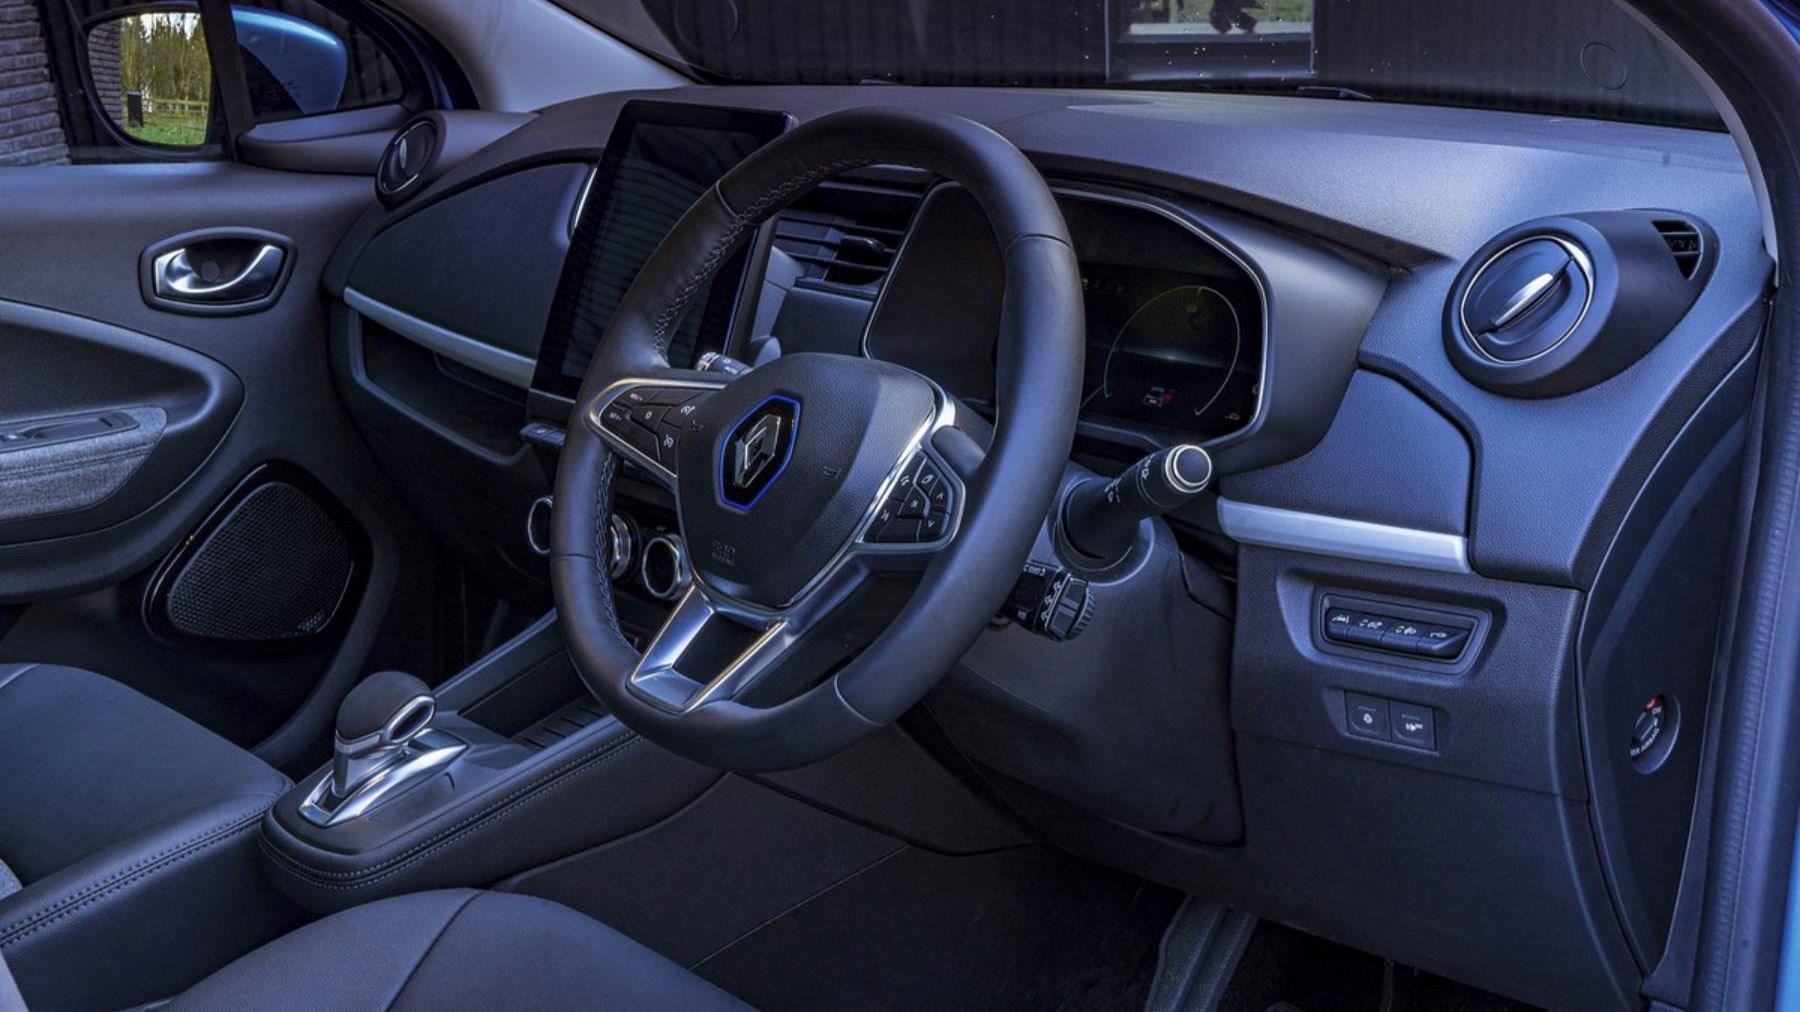 2021 Renault Zoe interior